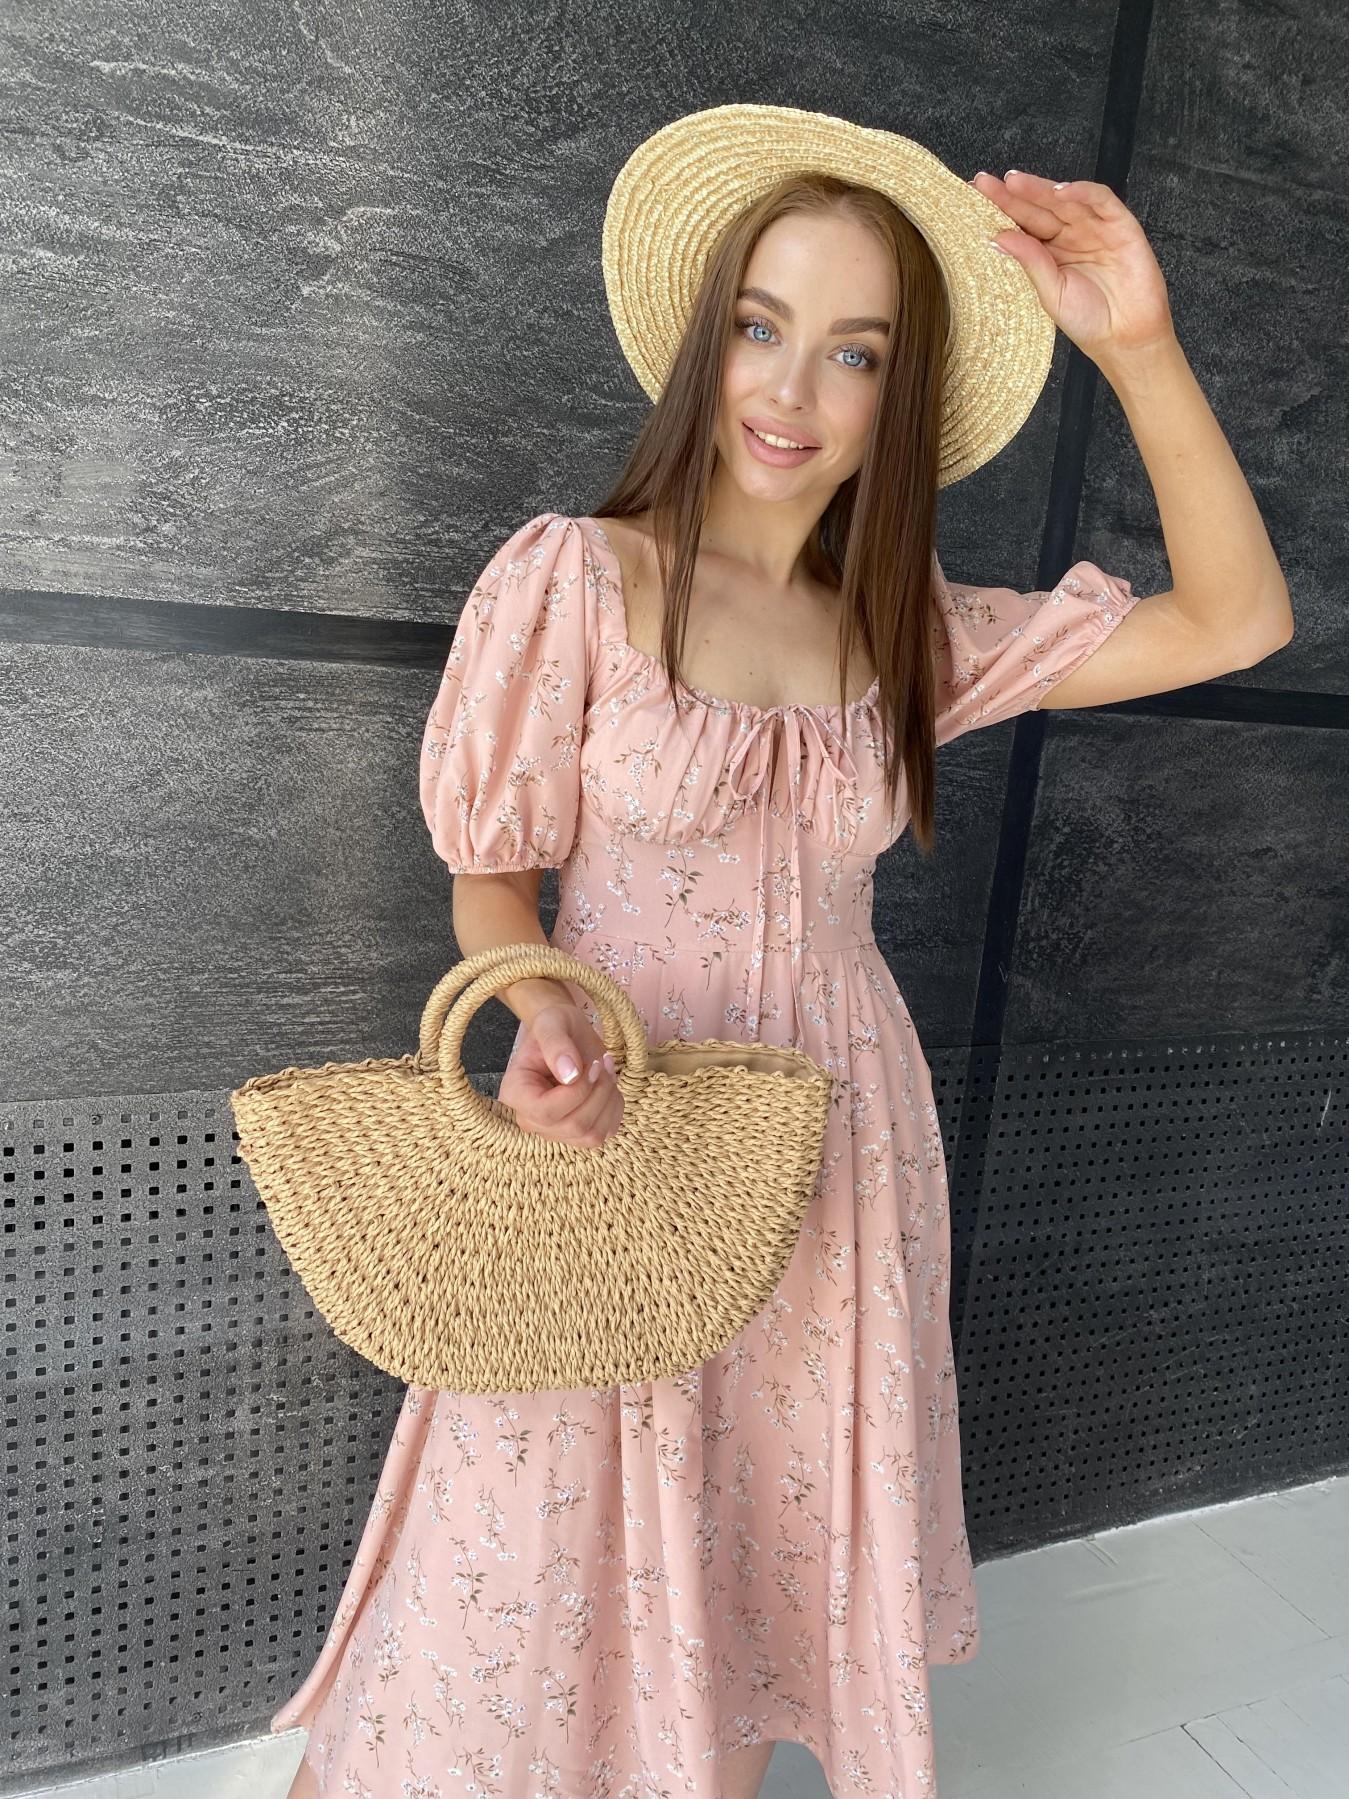 Кисес Миди платье из софт ткани в принт 11348 АРТ. 48150 Цвет: Пудра/букетики/бел/зел - фото 5, интернет магазин tm-modus.ru